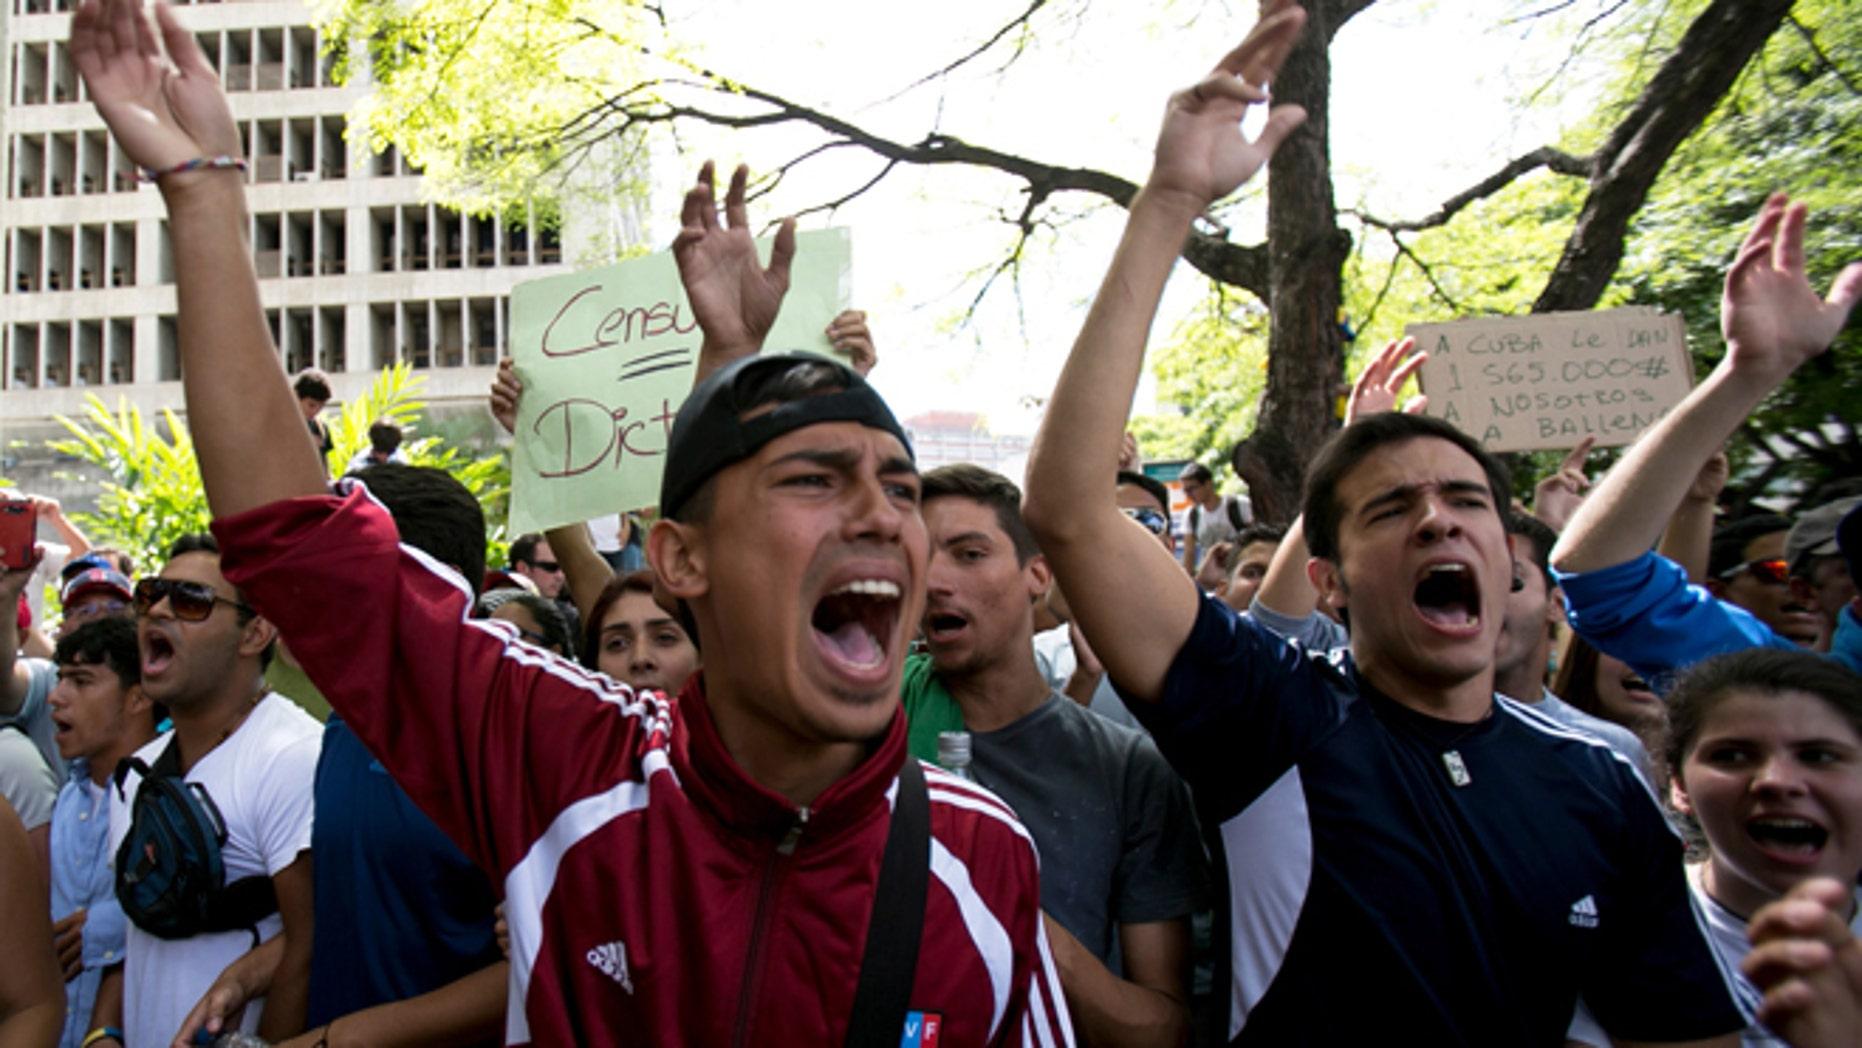 Feb. 17, 2014: Students shout slogans against Venezuela's President Nicolas Maduro during a march to Venezuelan Telecommunications Regulator Office or CONATEL in Caracas, Venezuela.